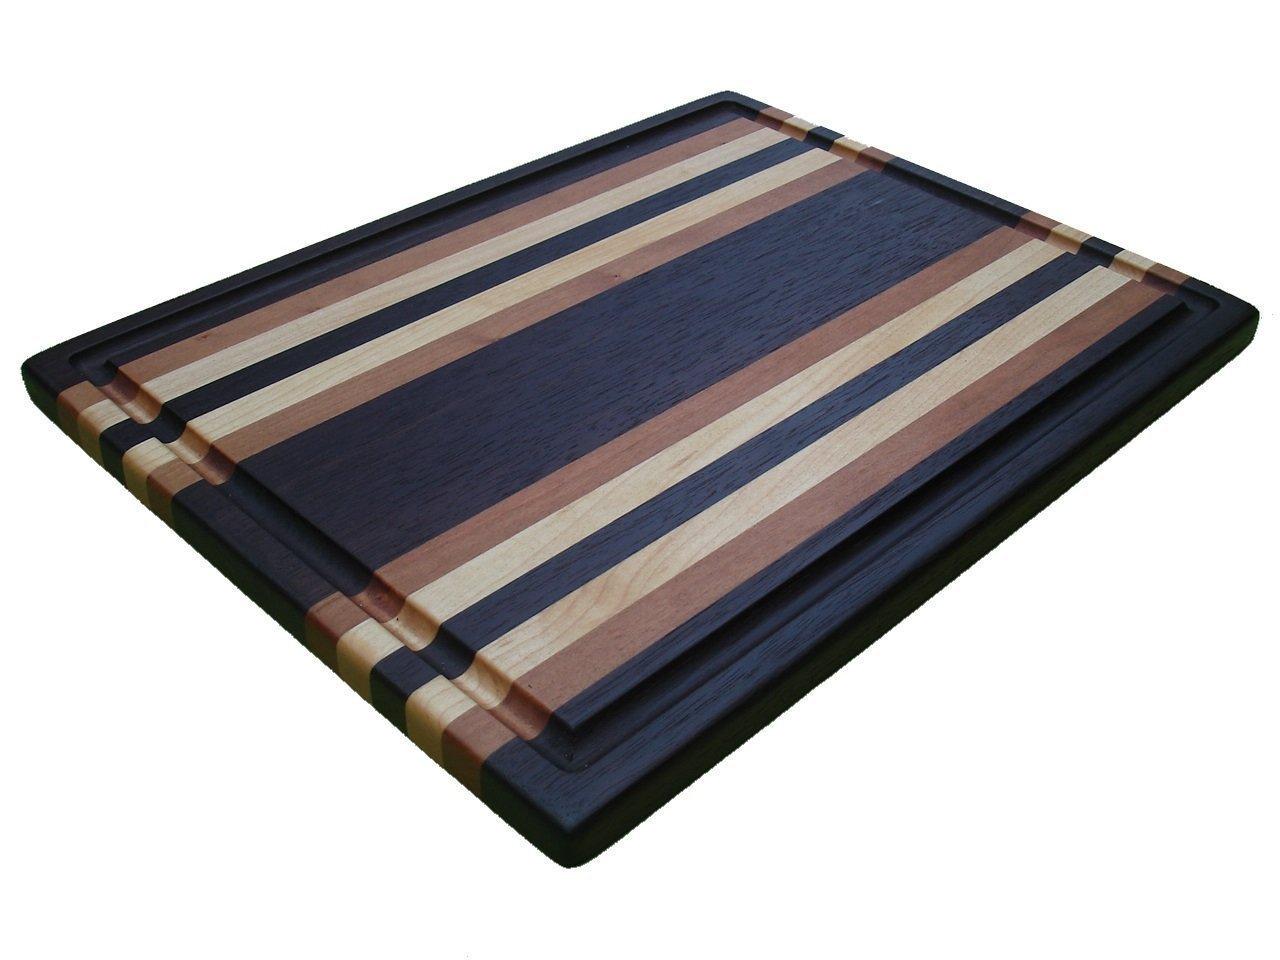 Manhattan Series Extra-Large Cutting Board - Walnut, Cherry & Maple